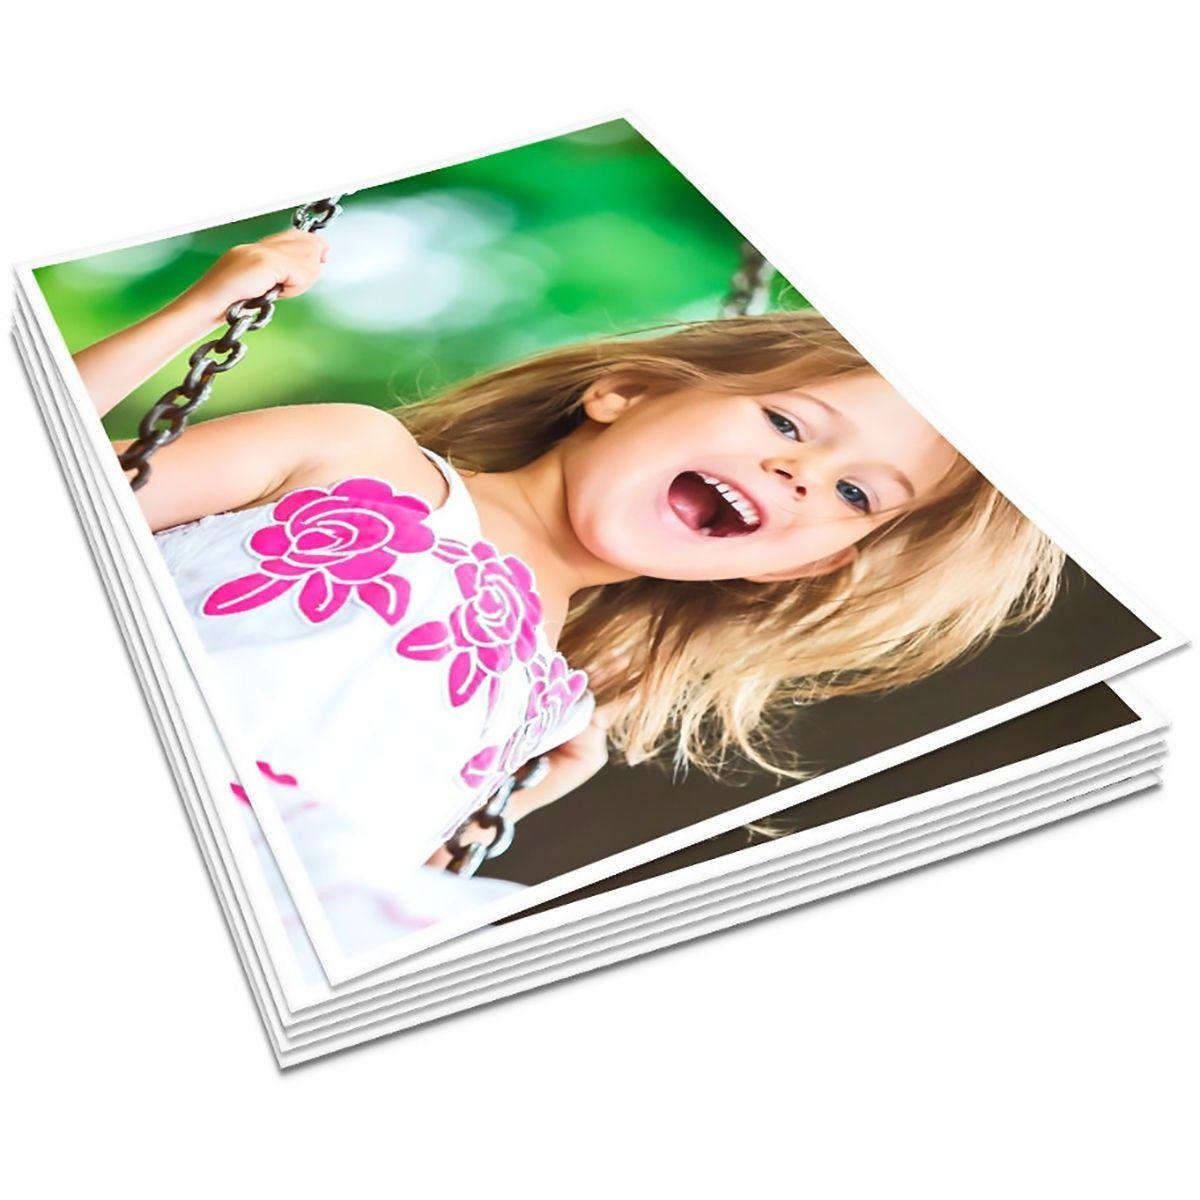 Papel Fotográfico A4 Dupla Face 180g Glossy Branco Brilhante Resistente à Água / 200 folhas